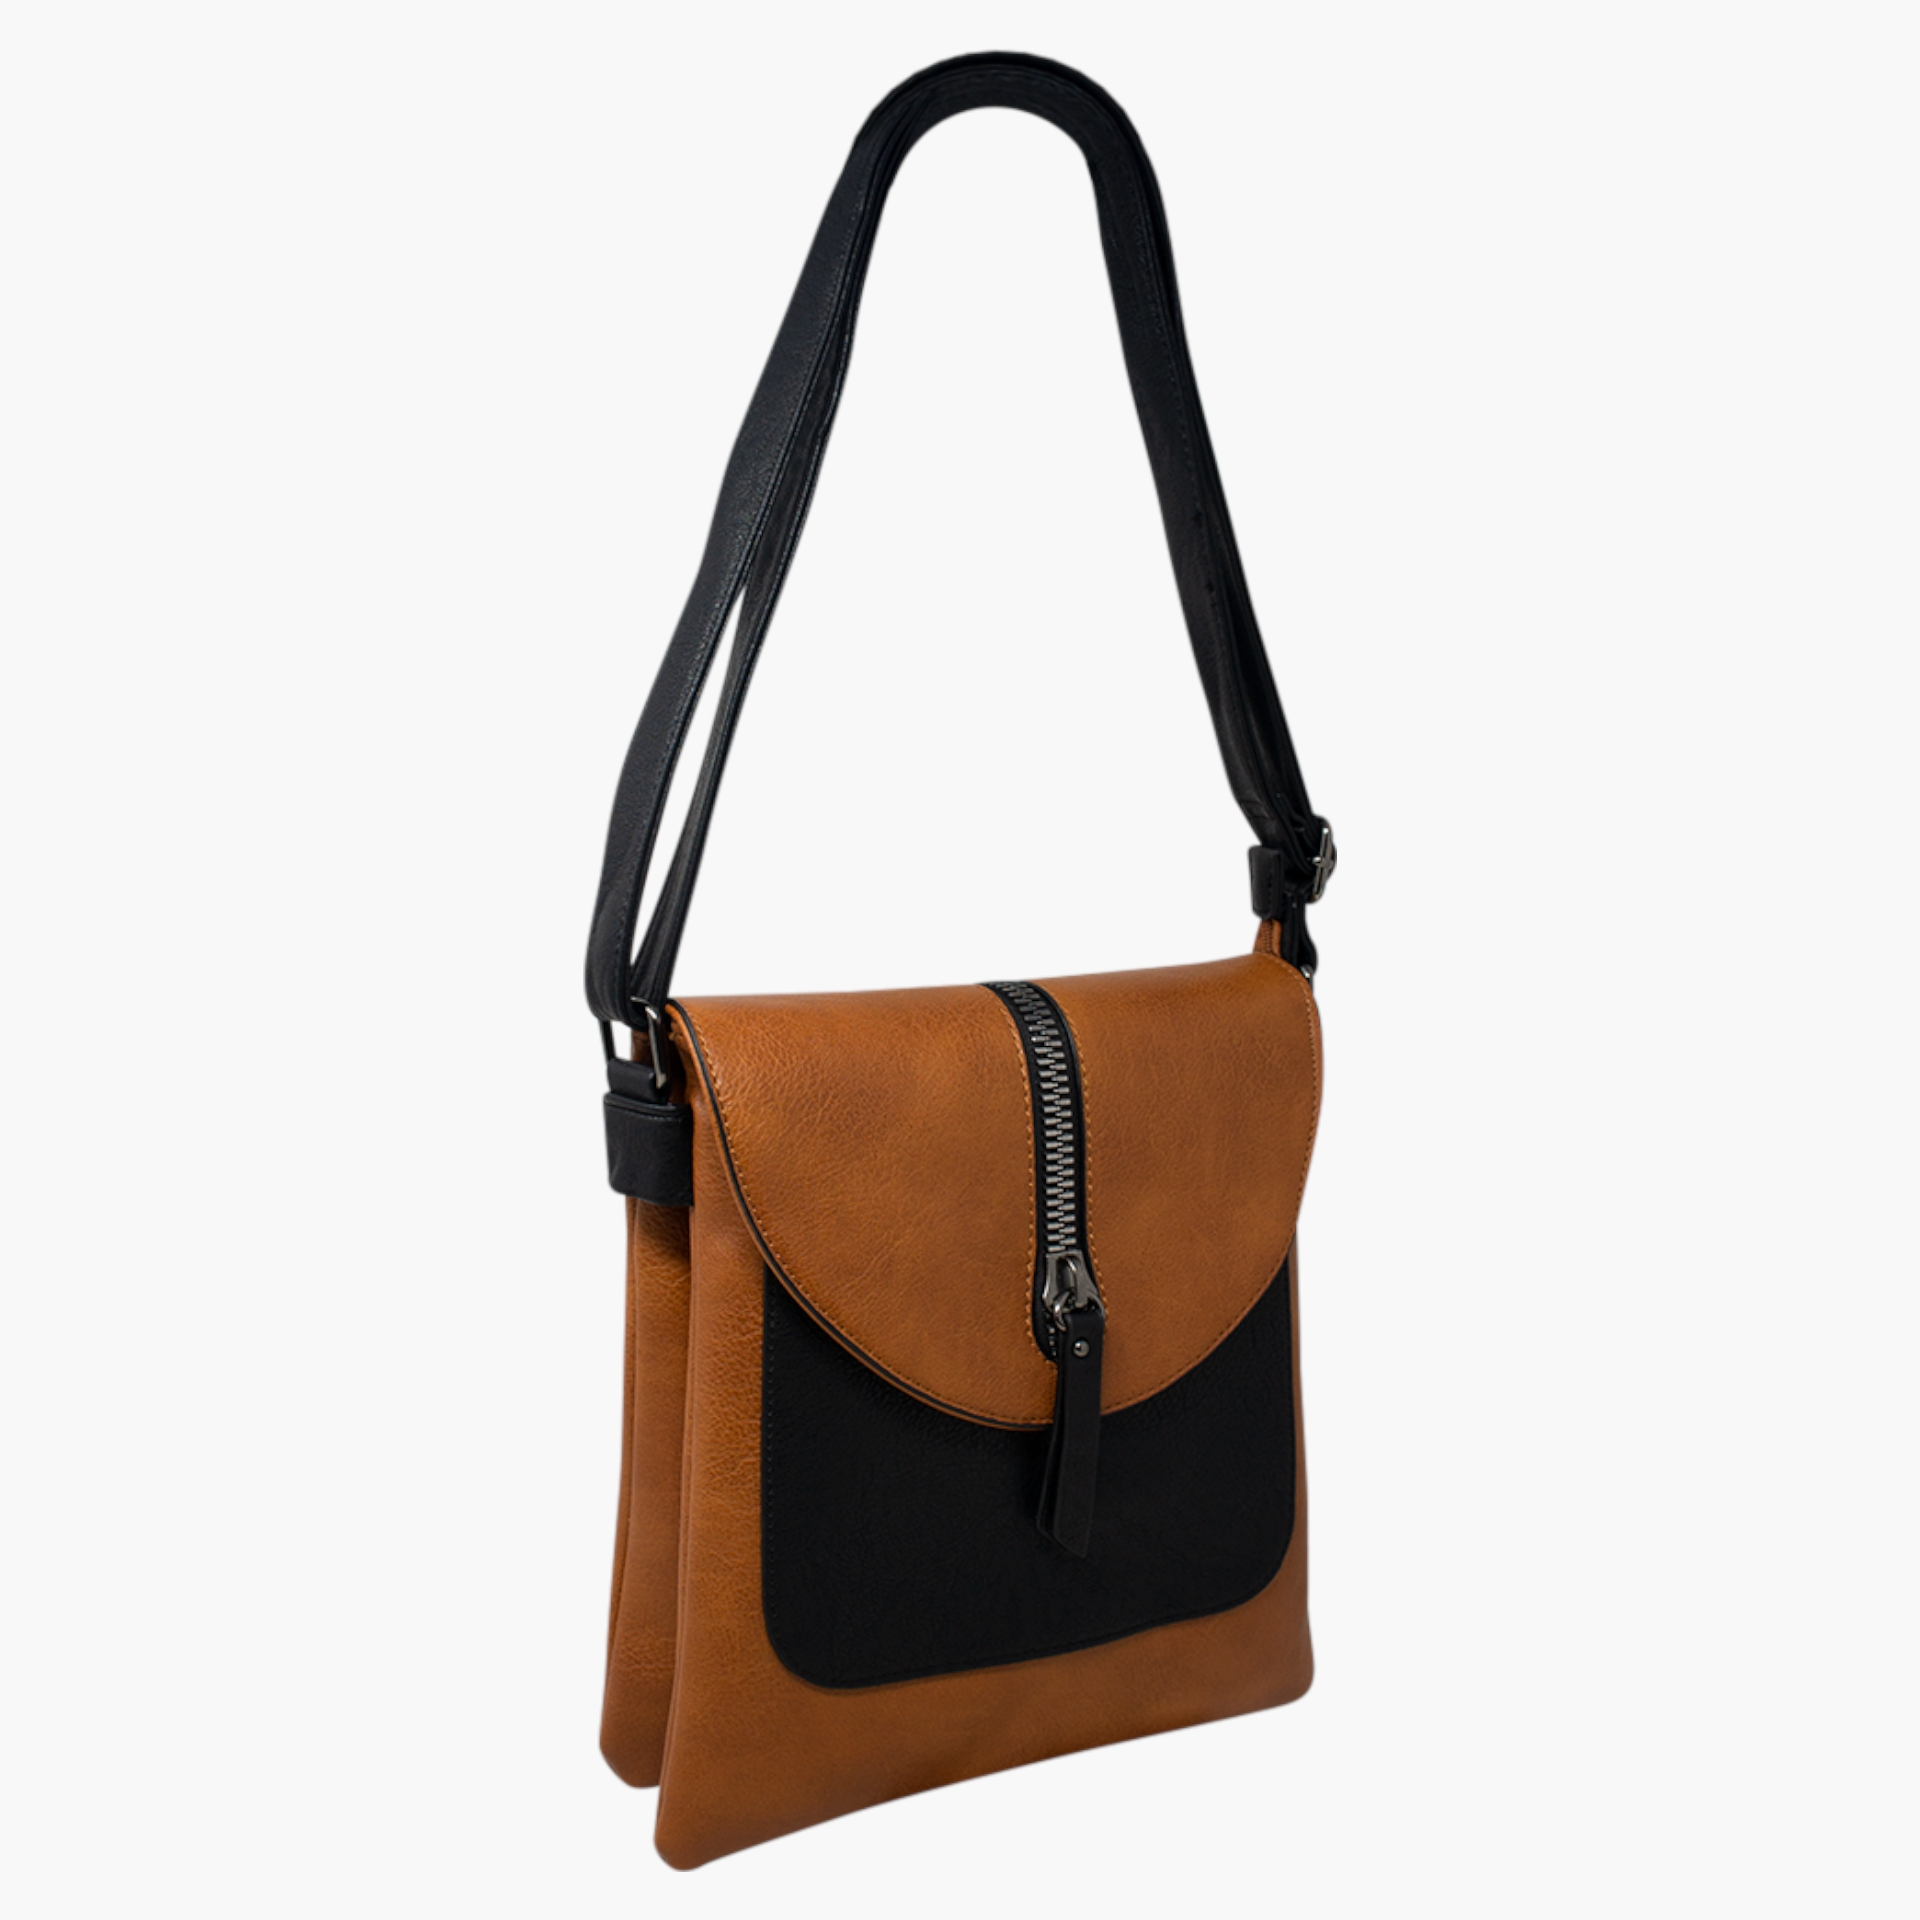 Cross Body Bag with Zip Detail - Tan/Black